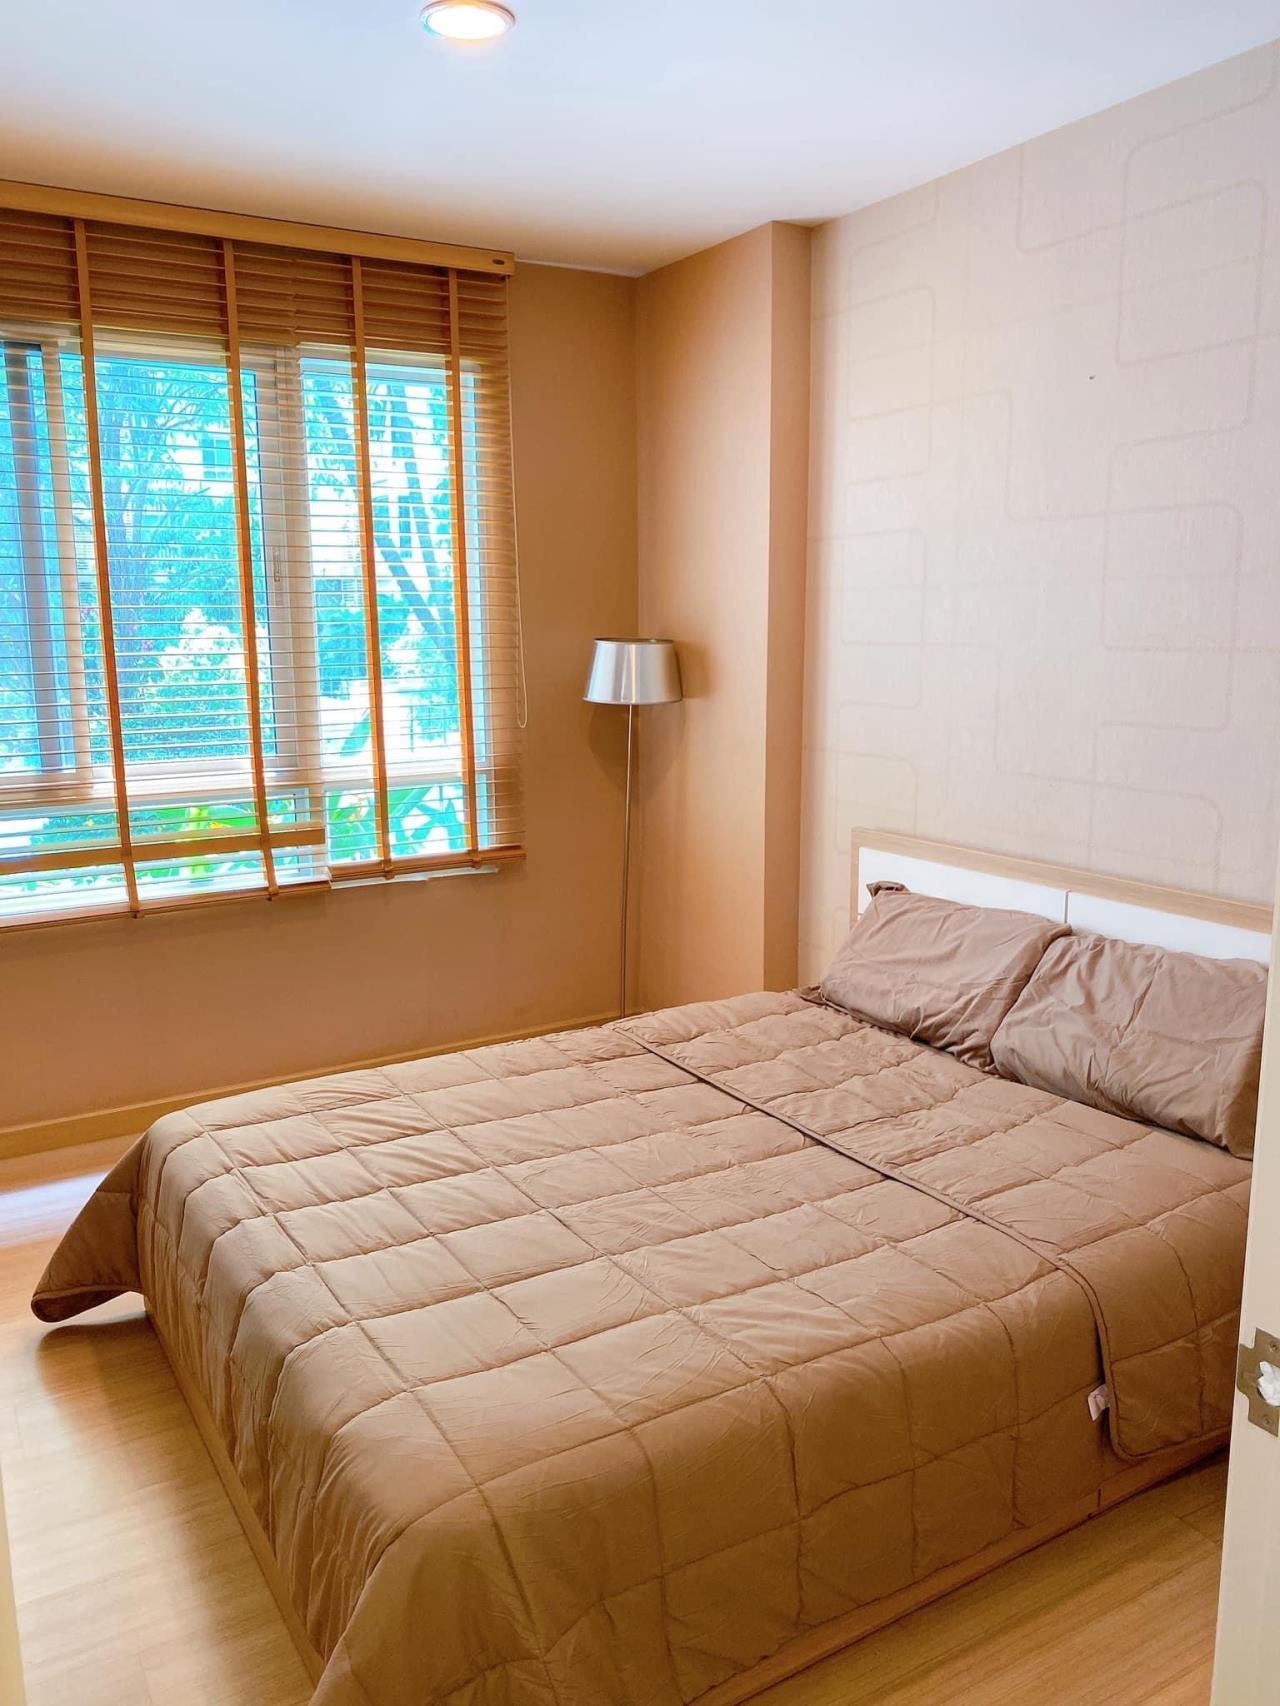 Agent - Phapayawarin Agency's Centric Scene Ratchavipha for Sale, 2 Bedroom 2 Bathroom, 75 Sq.m. 5